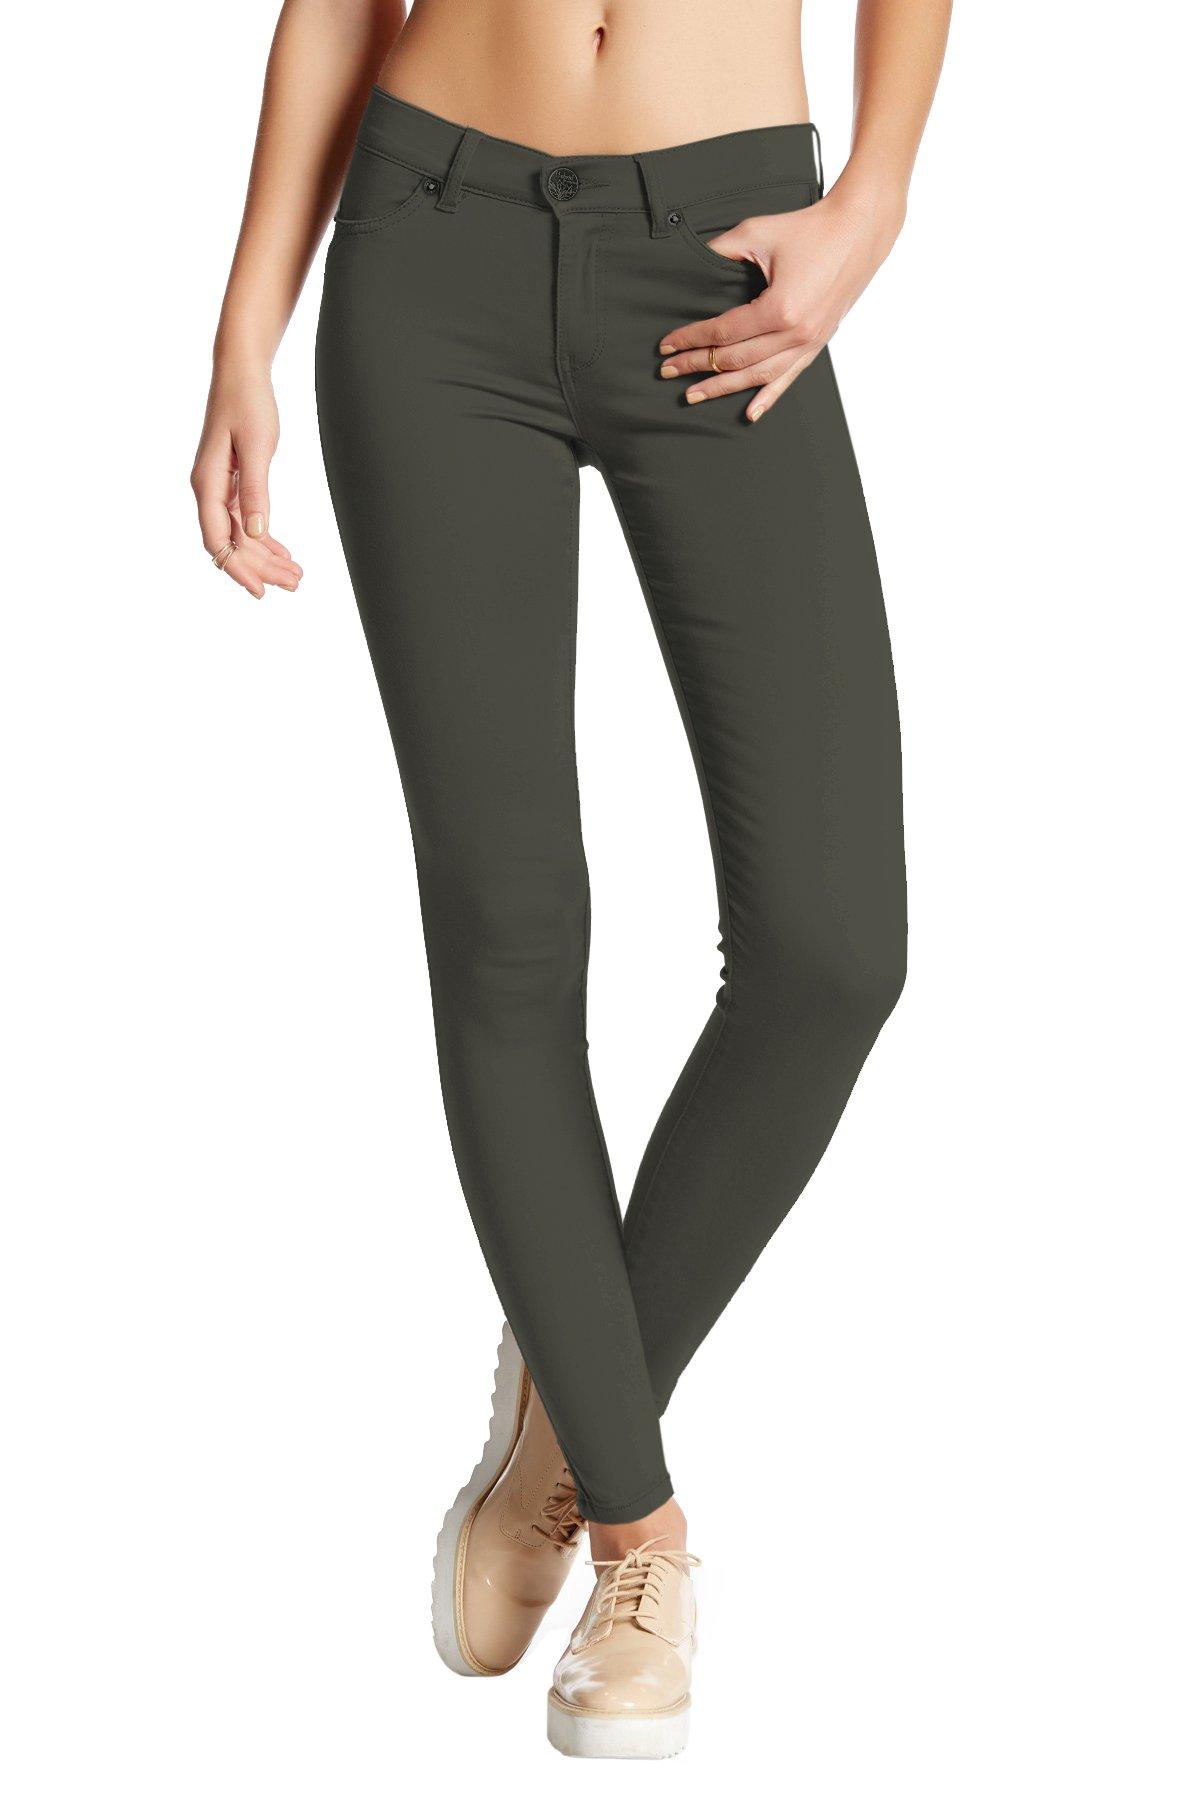 HyBrid & Company Womens Super Stretch Comfy Skinny Pants P44876SK Olive Small